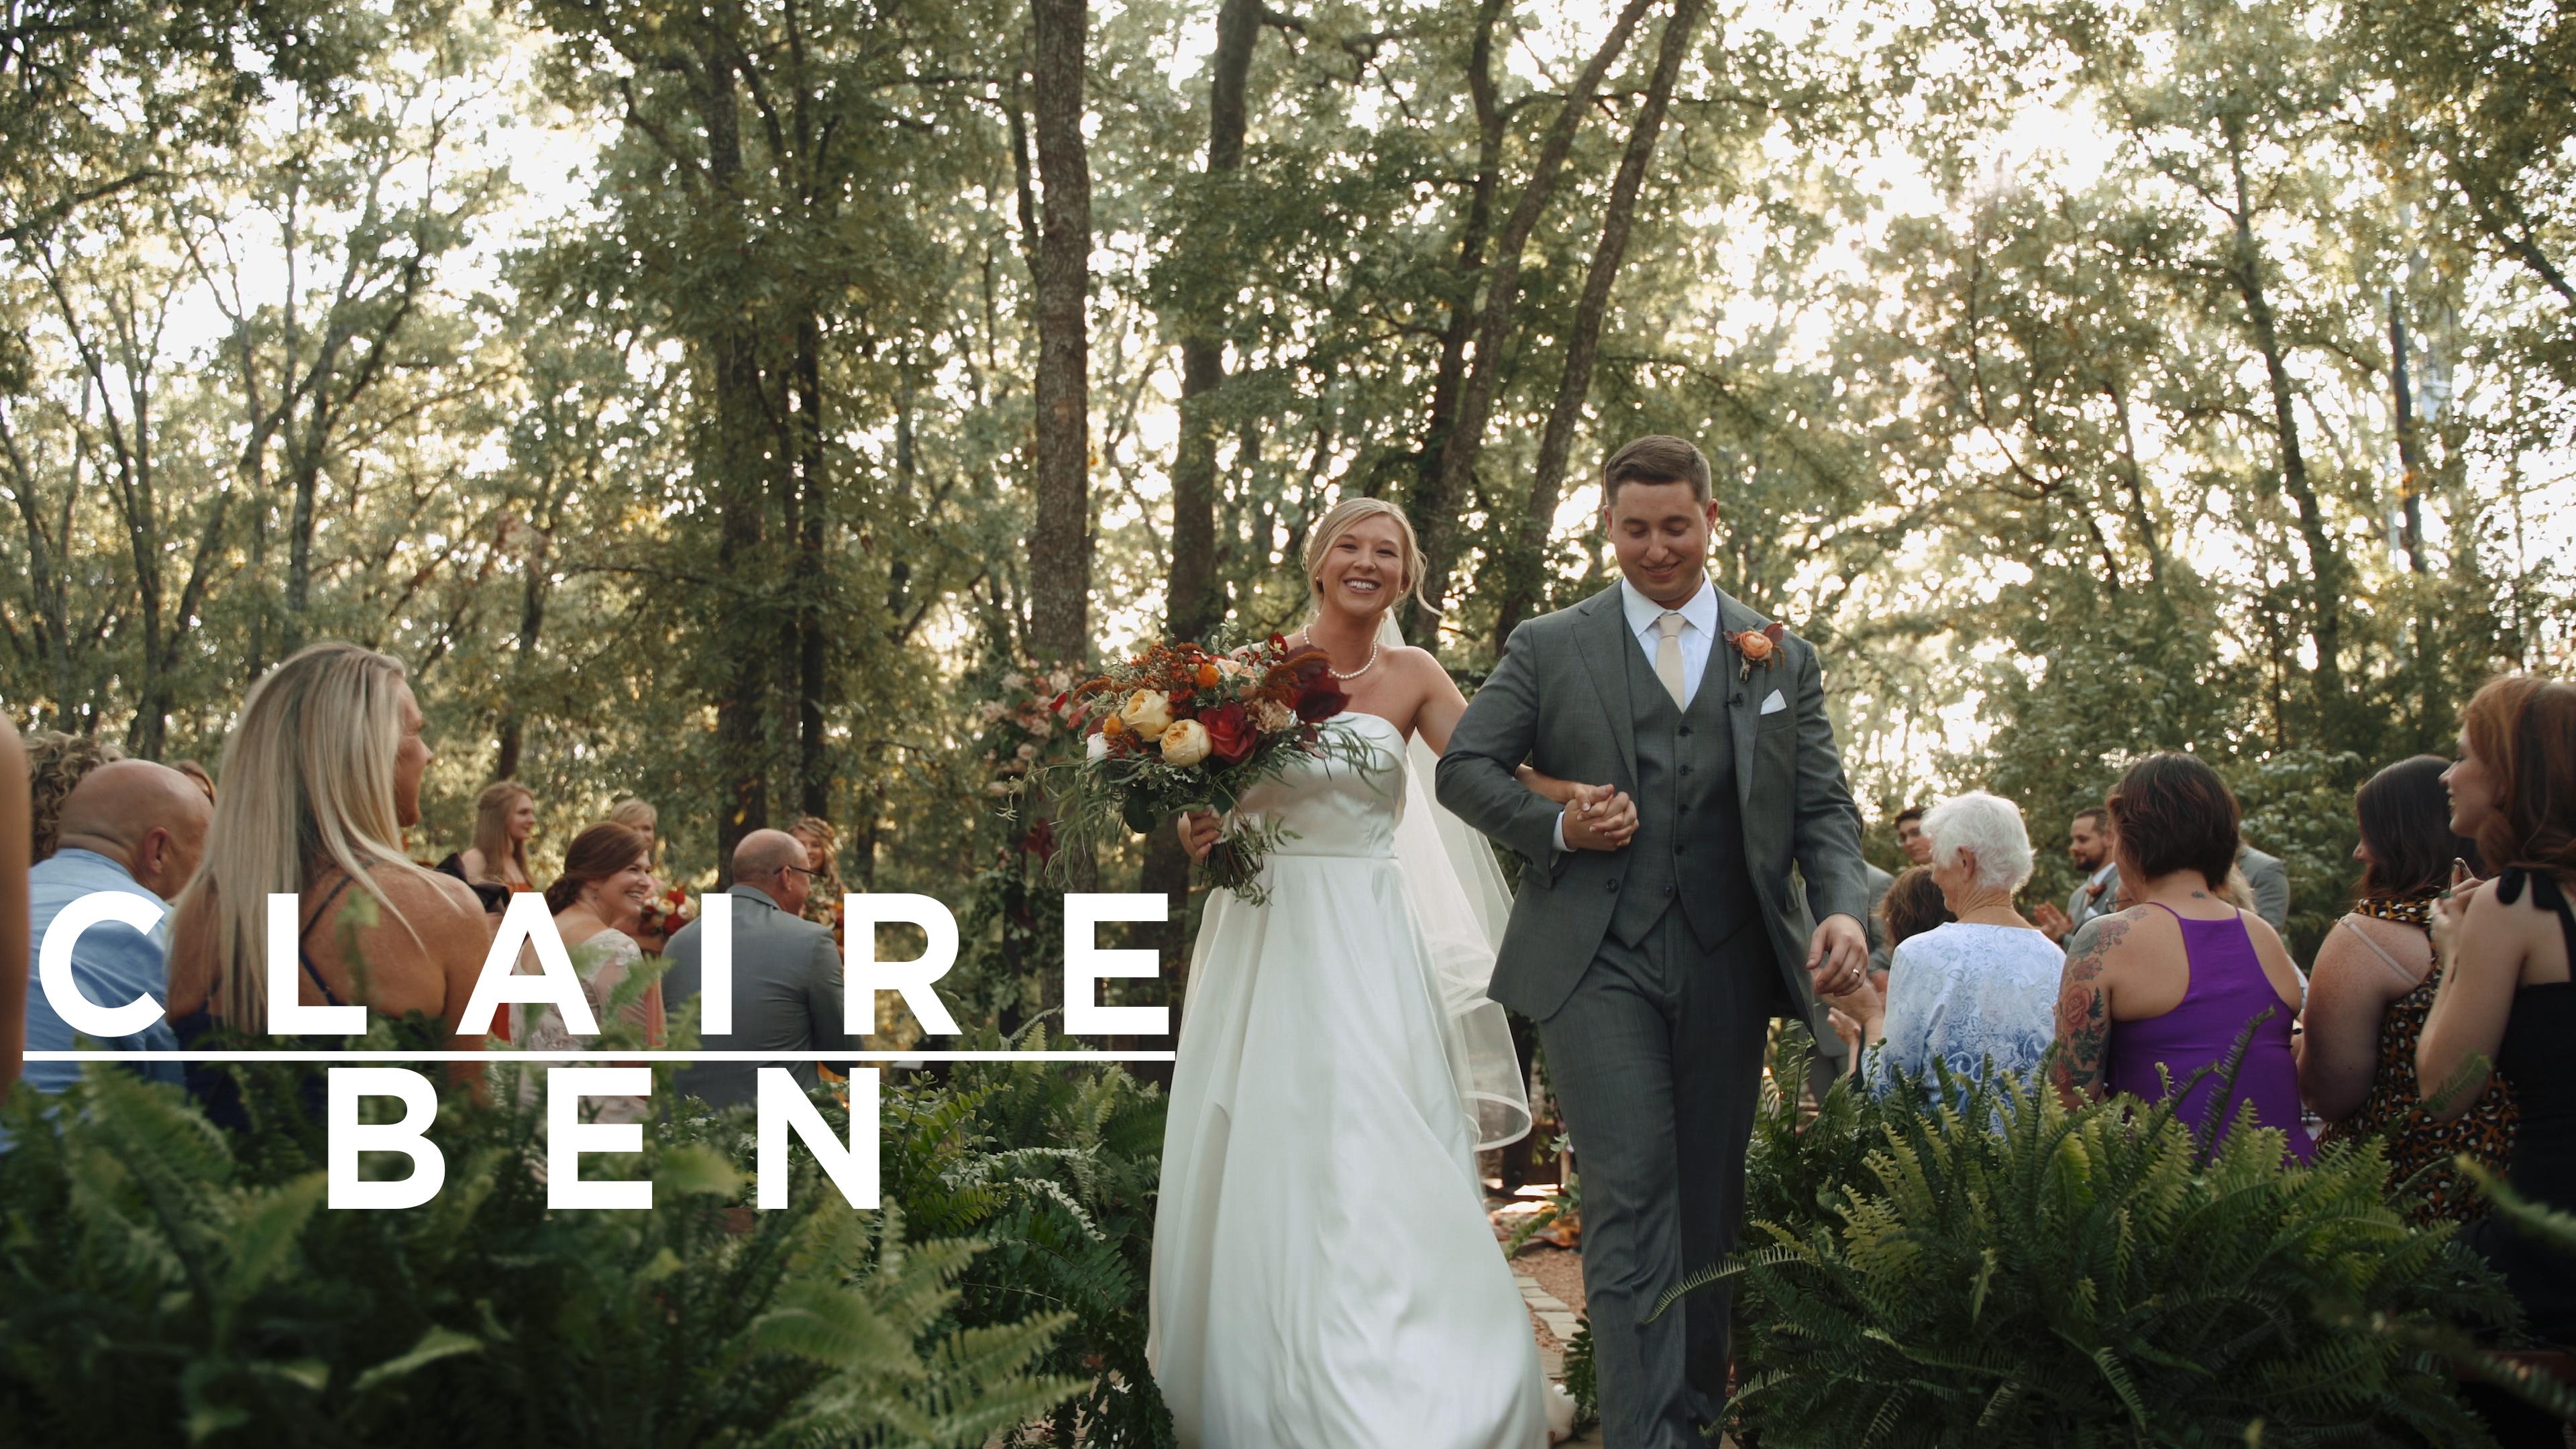 Claire + Ben | Greenville, Texas | Under The Wildwood